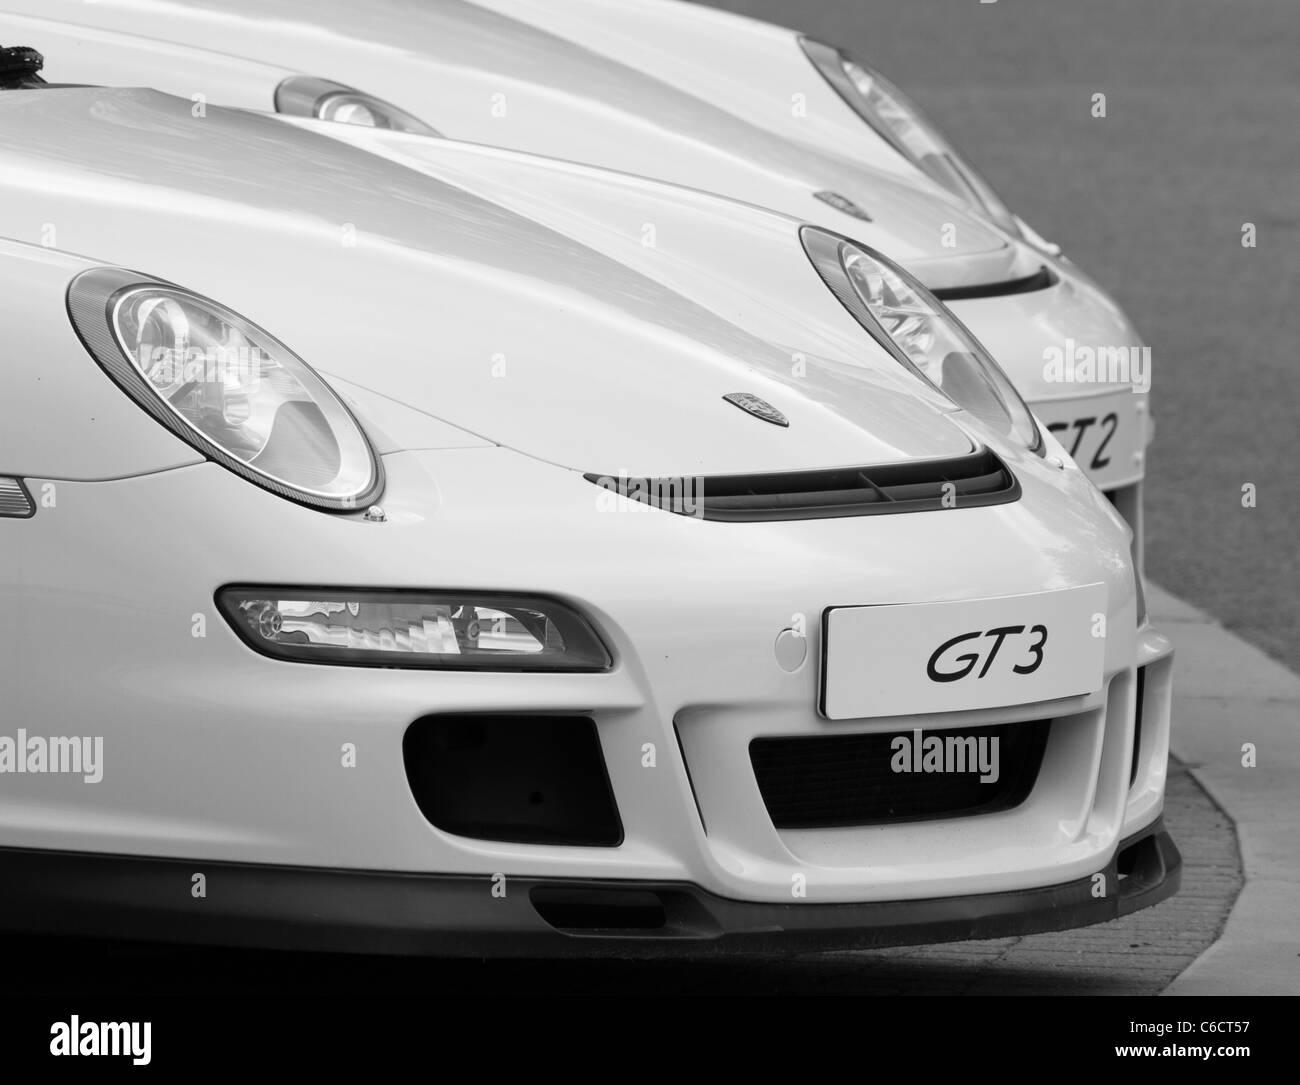 Porsche display - Stock Image